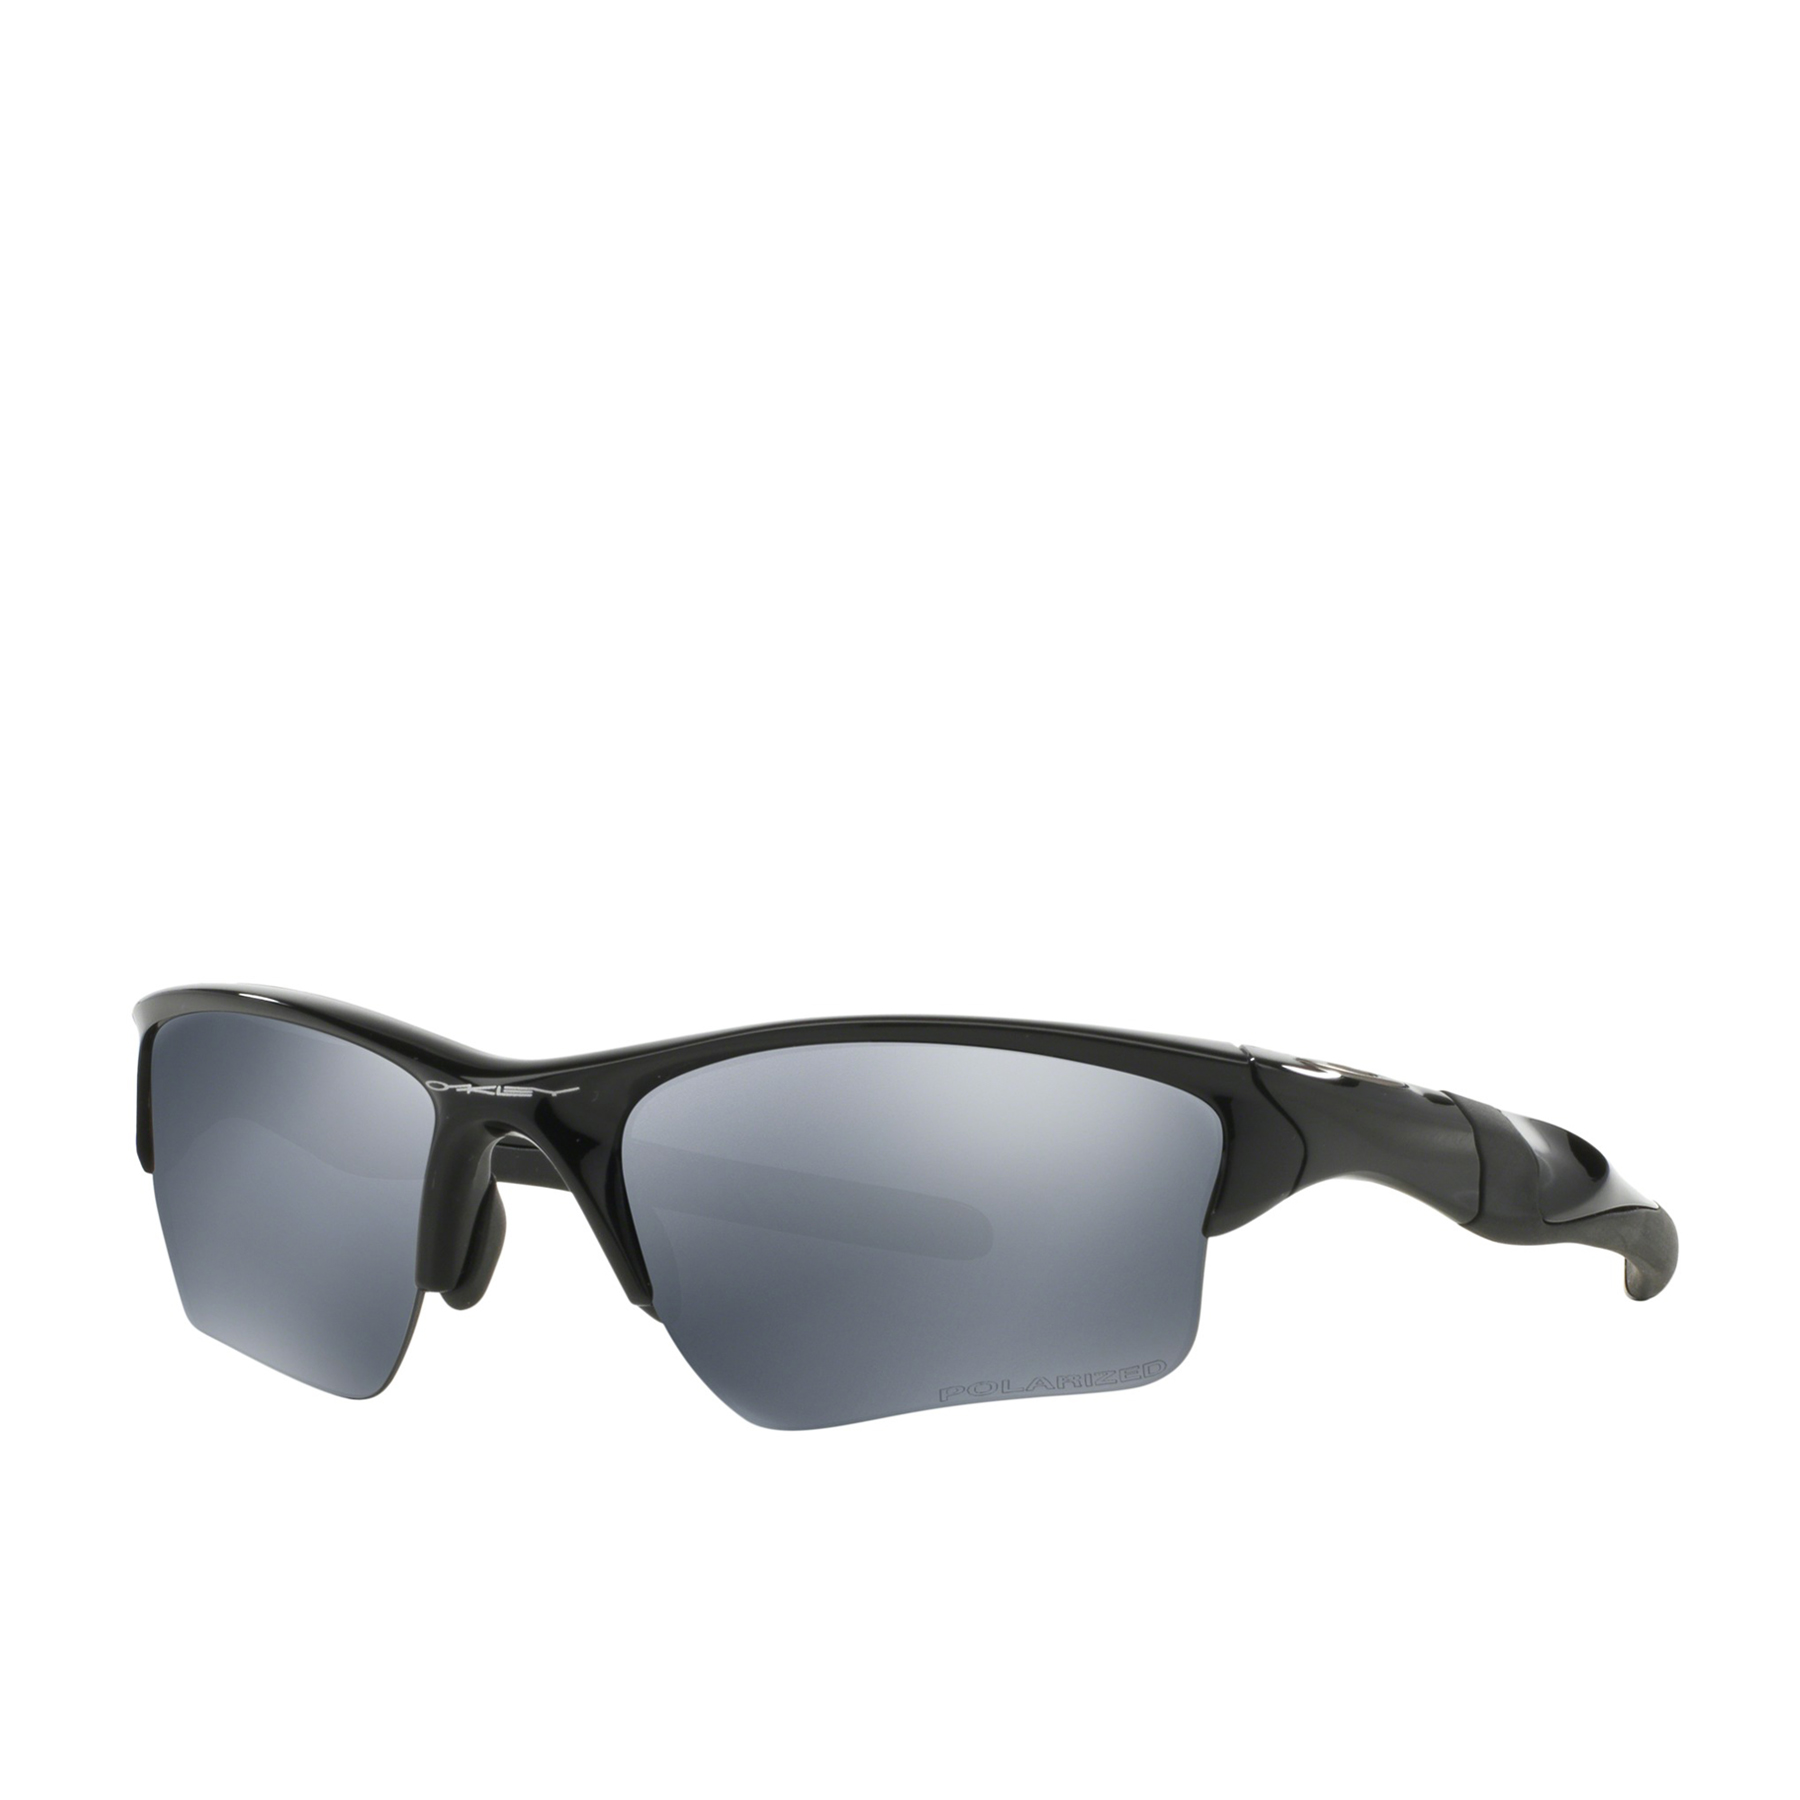 Oakley Half Jacket 2.0 XL Mens Sunglasses - Polished Black ~ Black Iridium